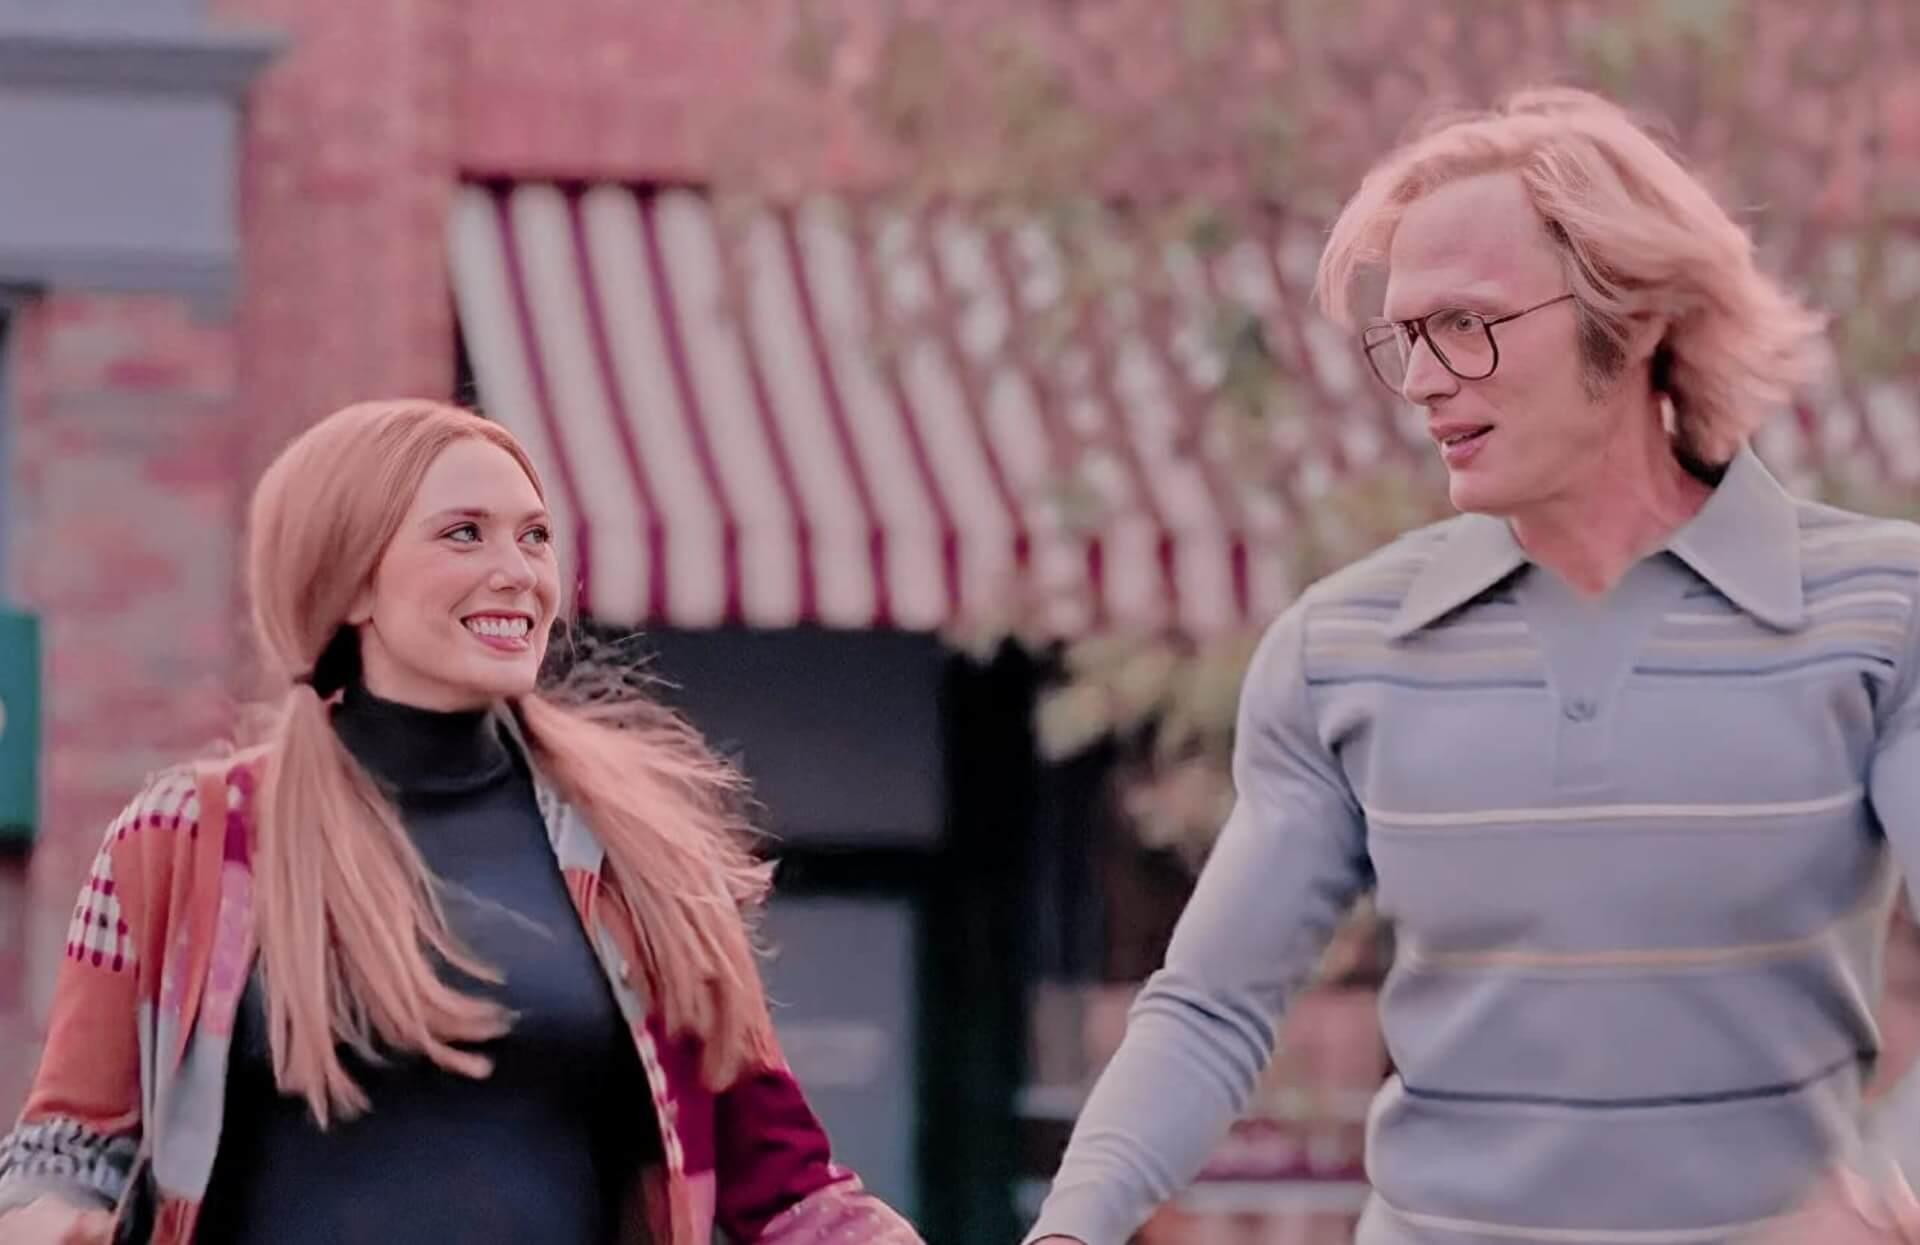 Wanda的長直髮和Vision的方框眼鏡都是當年的流行指標。